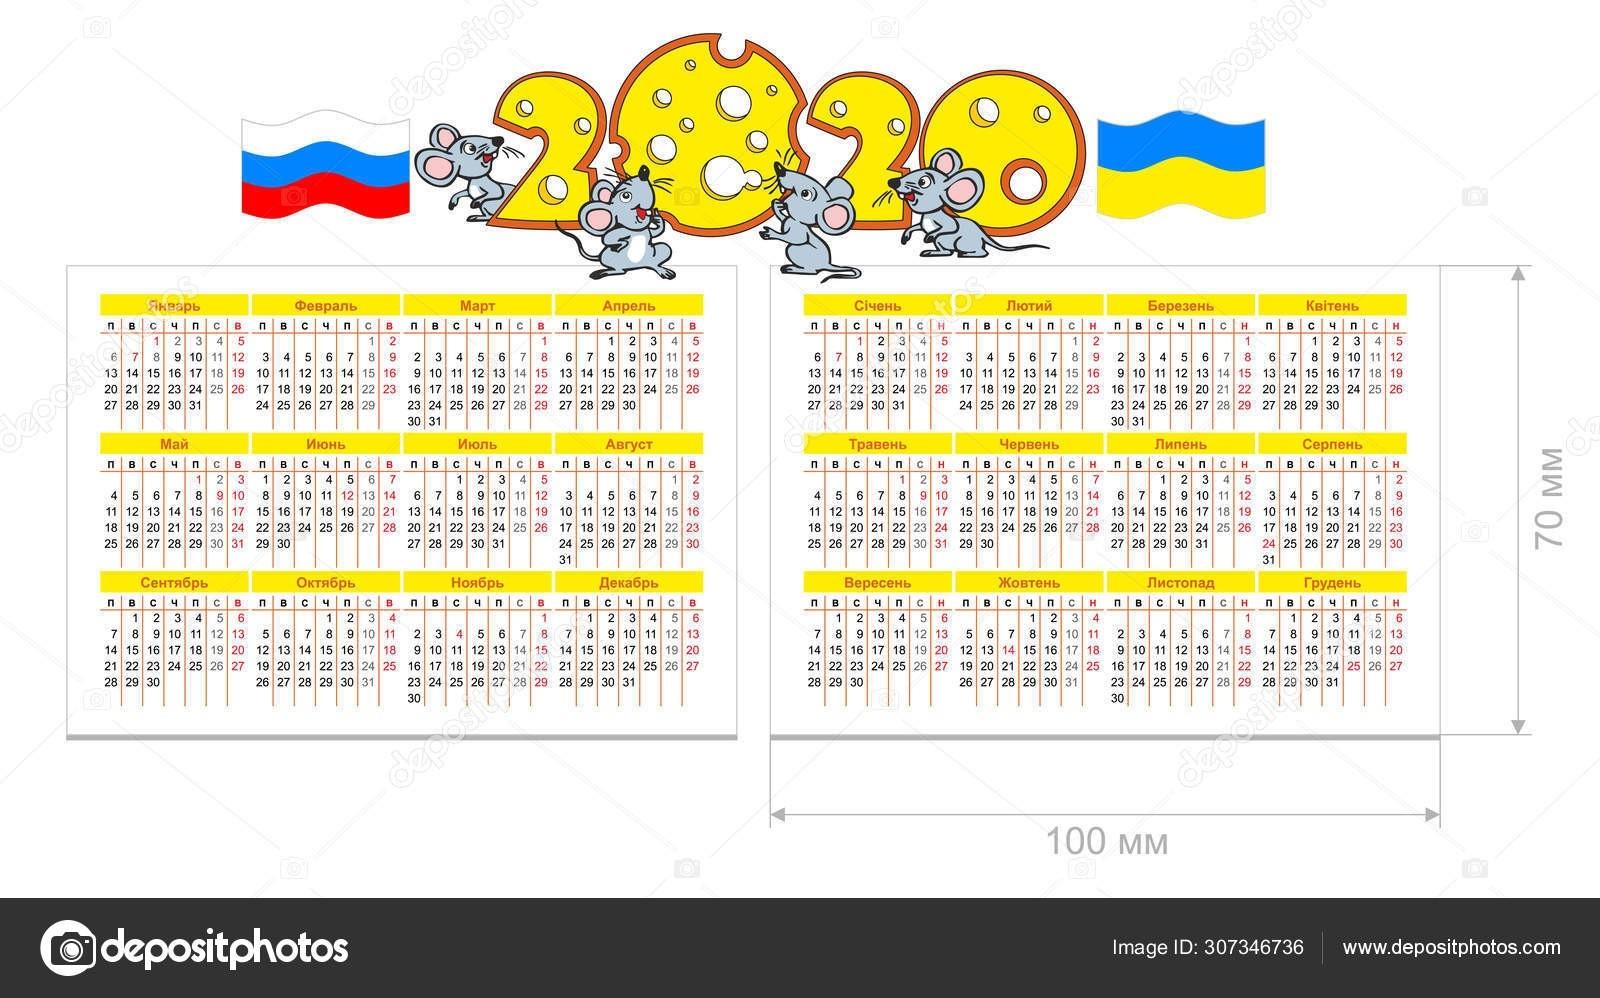 2020 Pocket Calendar — Stock Vector © Virtis #307346736-Calendar For 2020 Indicating Public Holidays